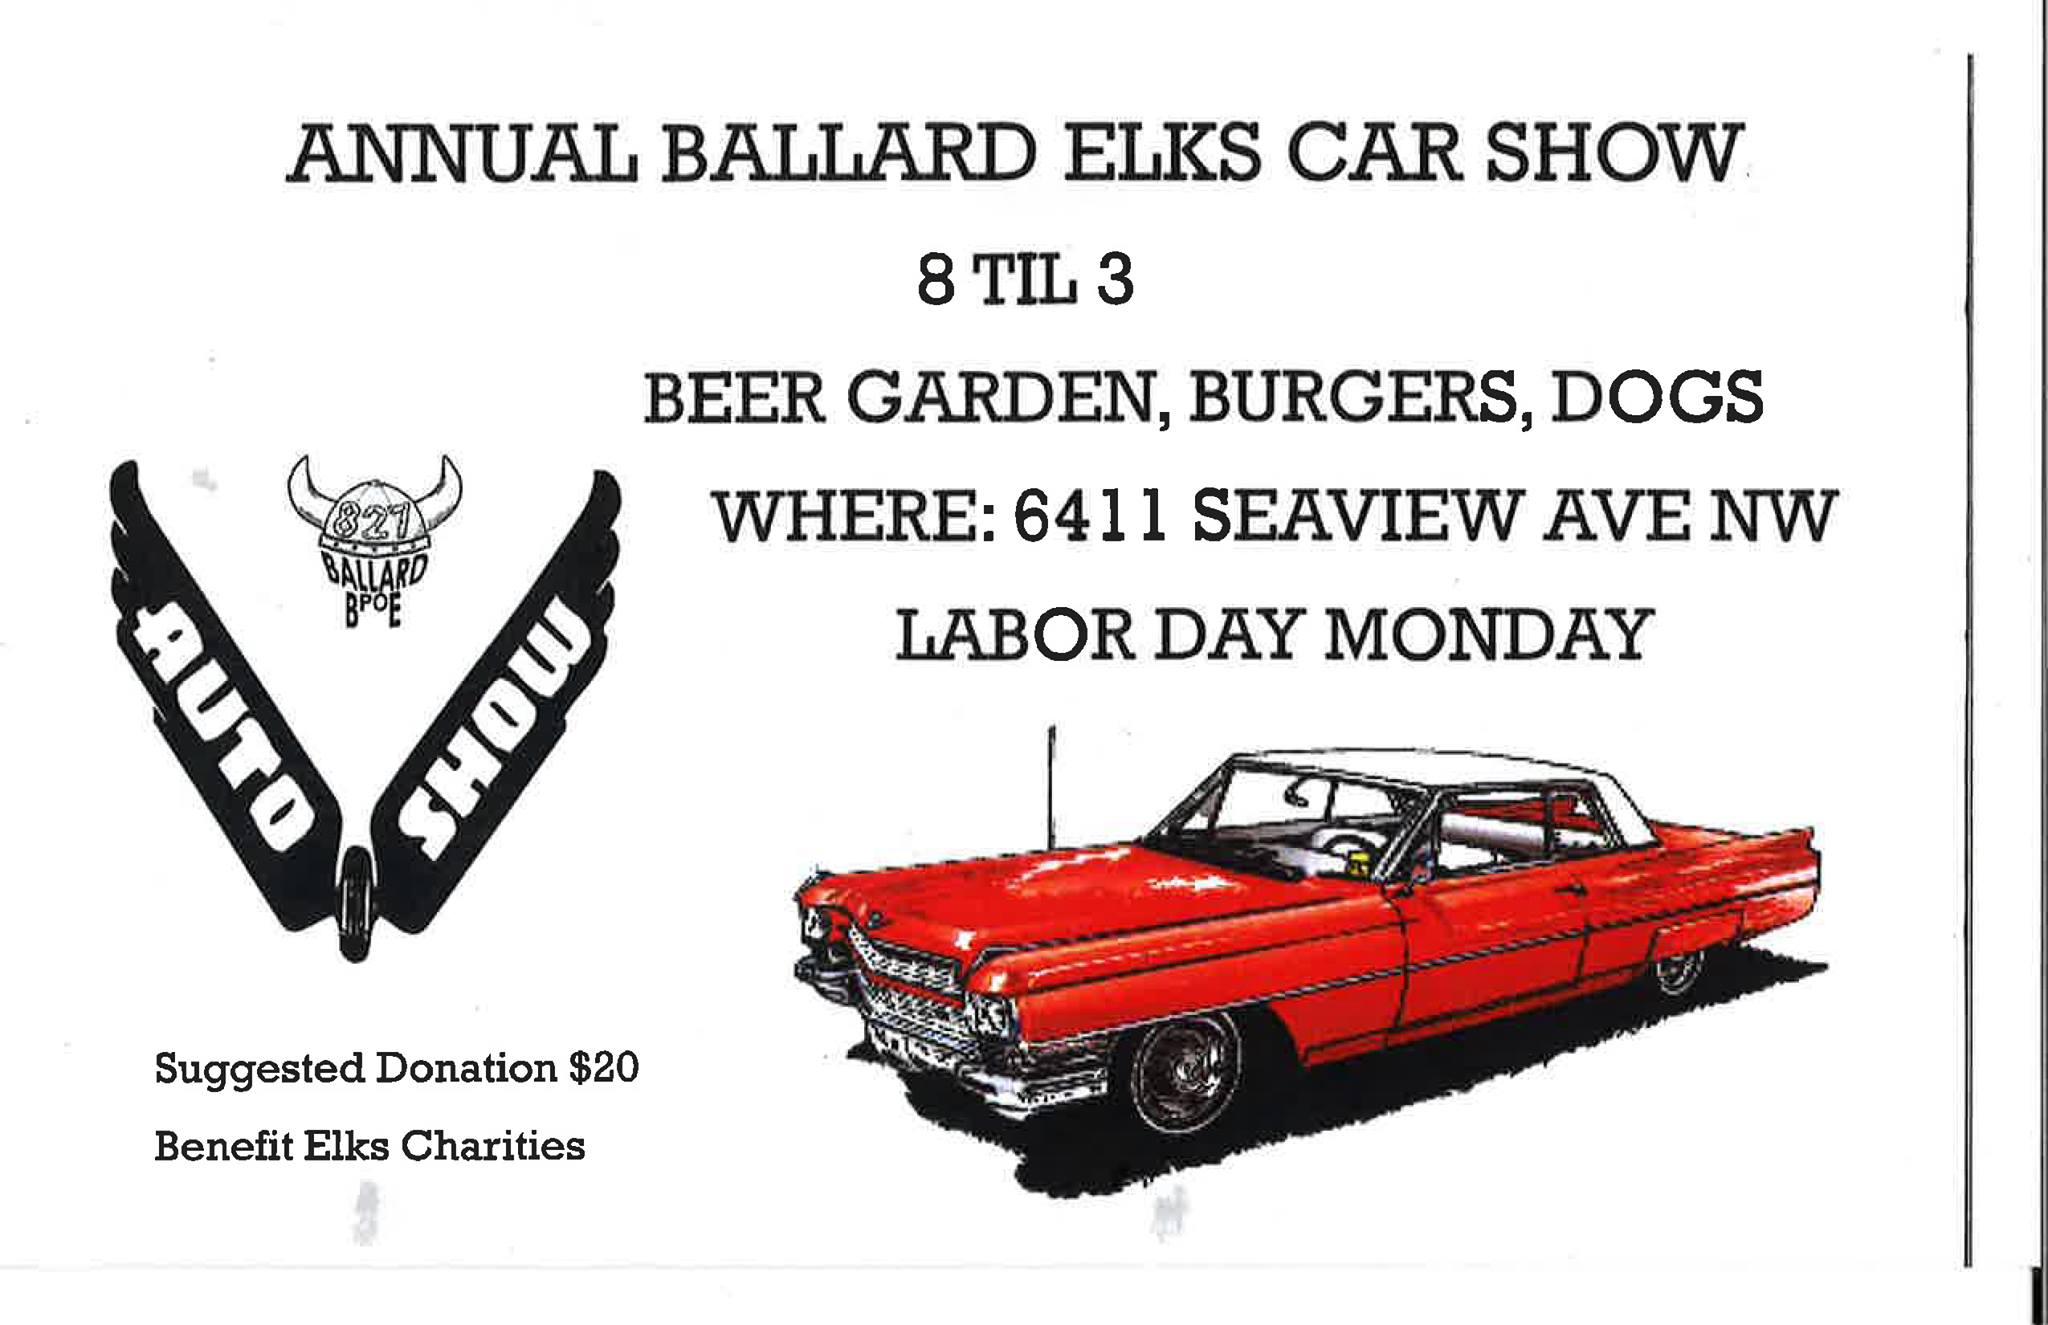 Ballard Elks Car Show